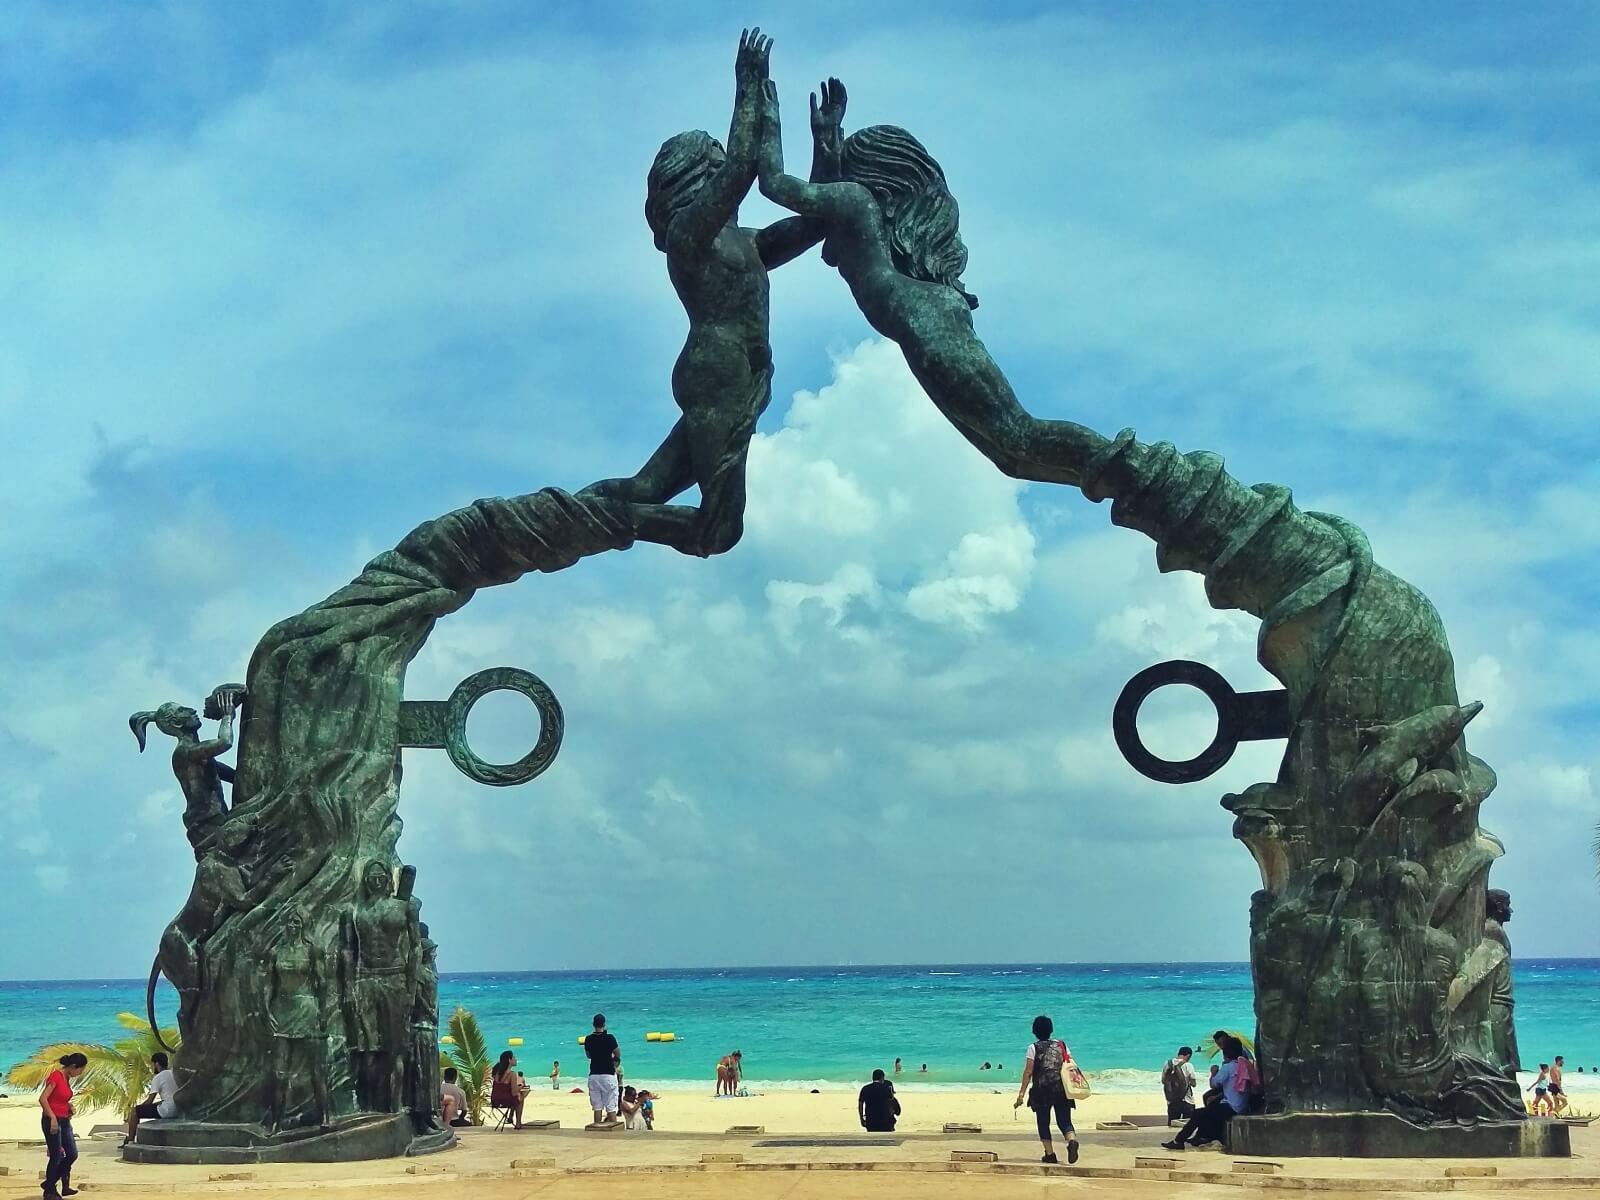 Morska brama w Playa del Carmen w Meksyku.